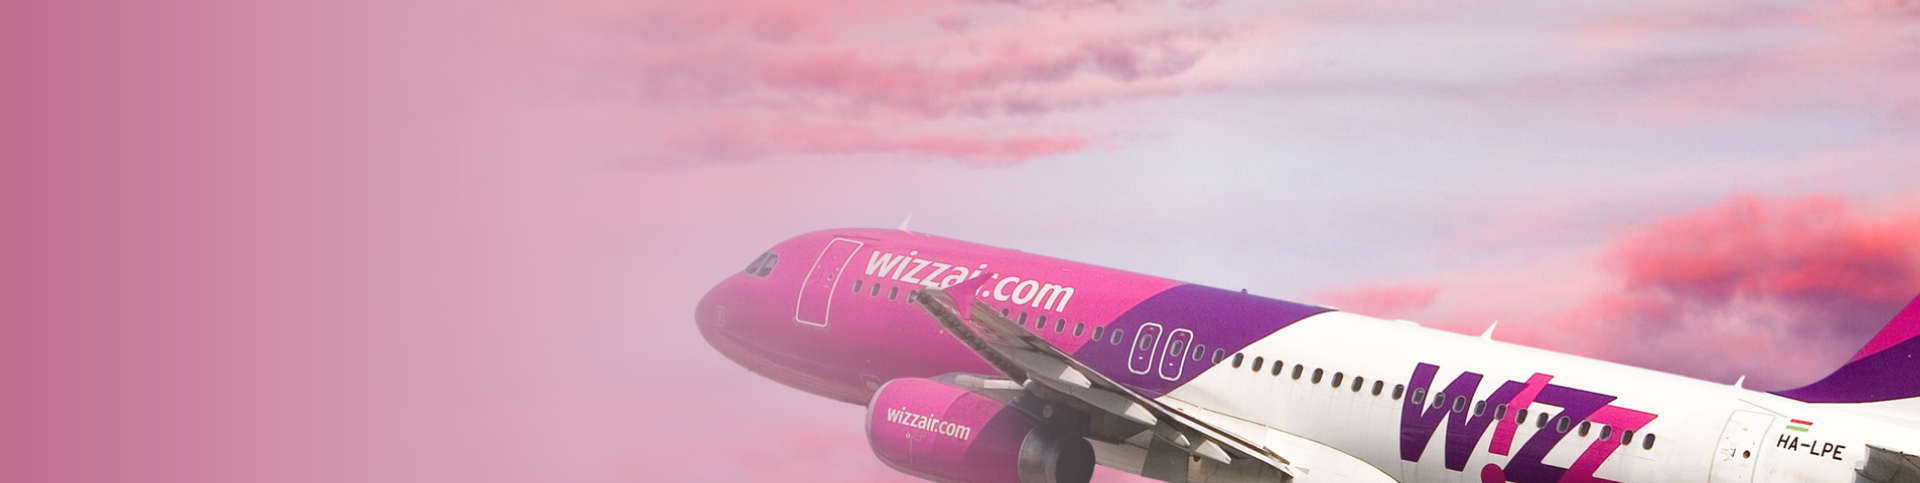 Wizzair - Авиакомпания Wizzair